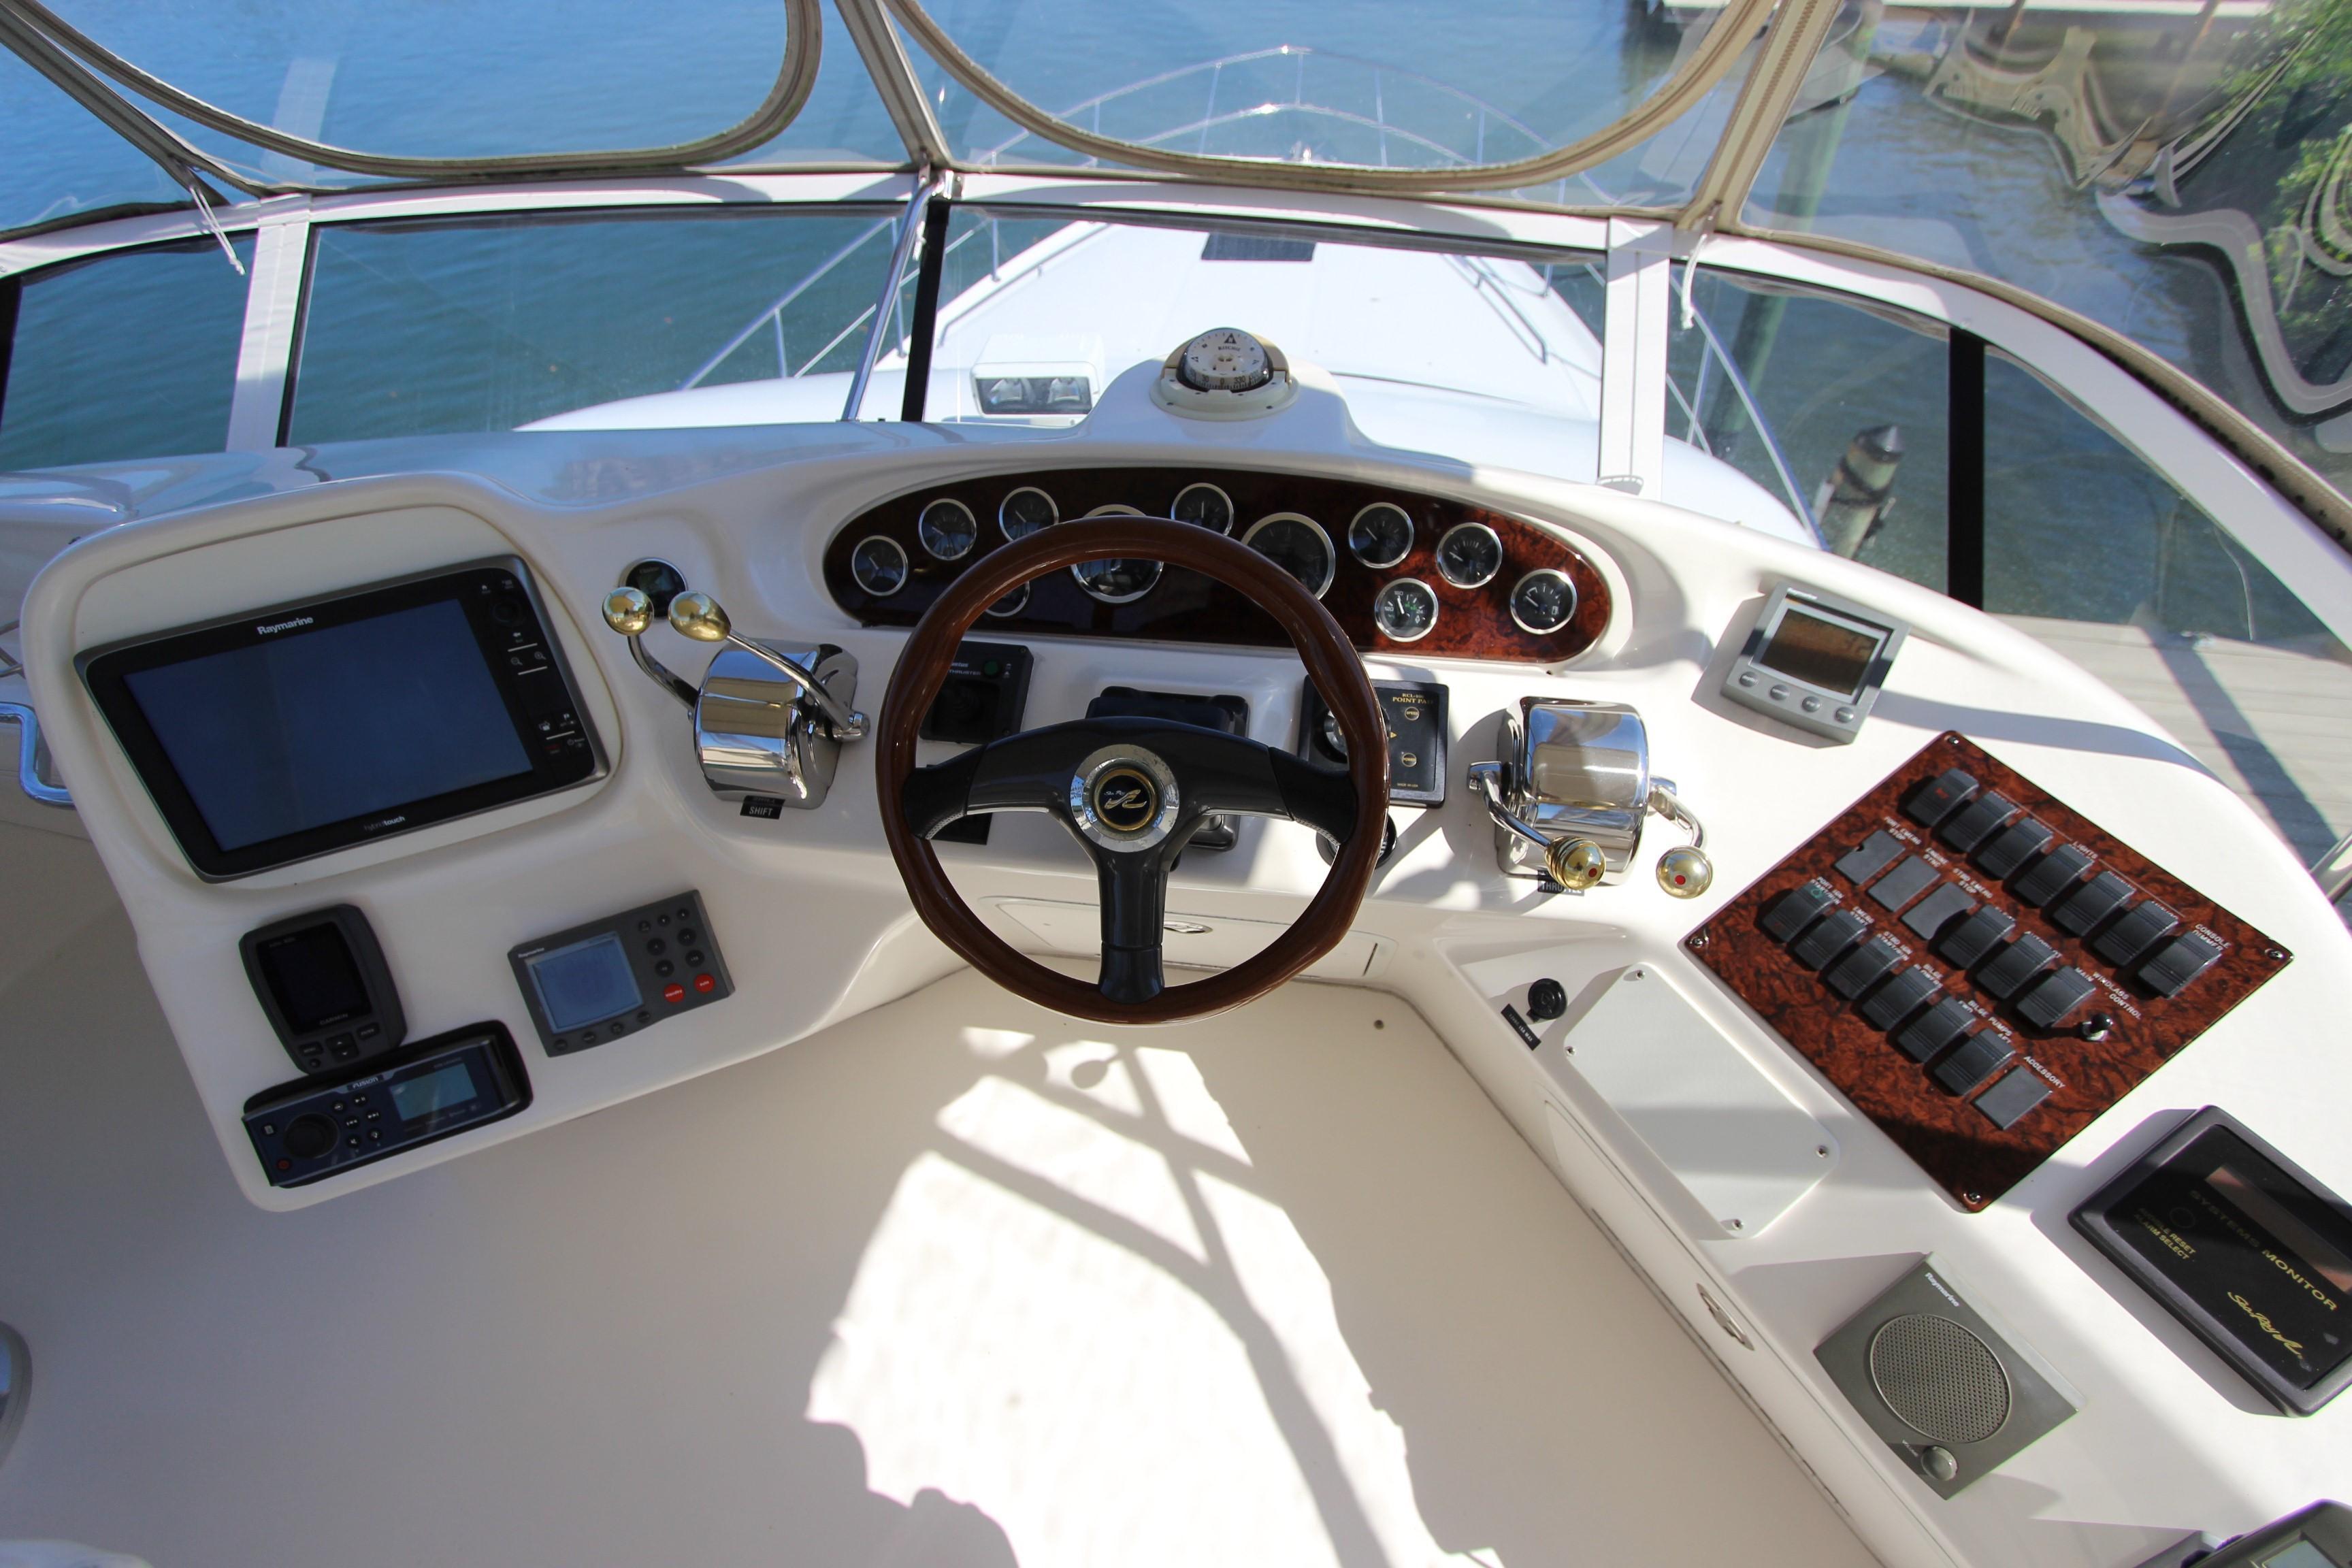 6338999_20170817104351924_1_XLARGE&w=924&h=693&t=1502995534000 2003 sea ray 400 sedan bridge power boat for sale www yachtworld com  at webbmarketing.co